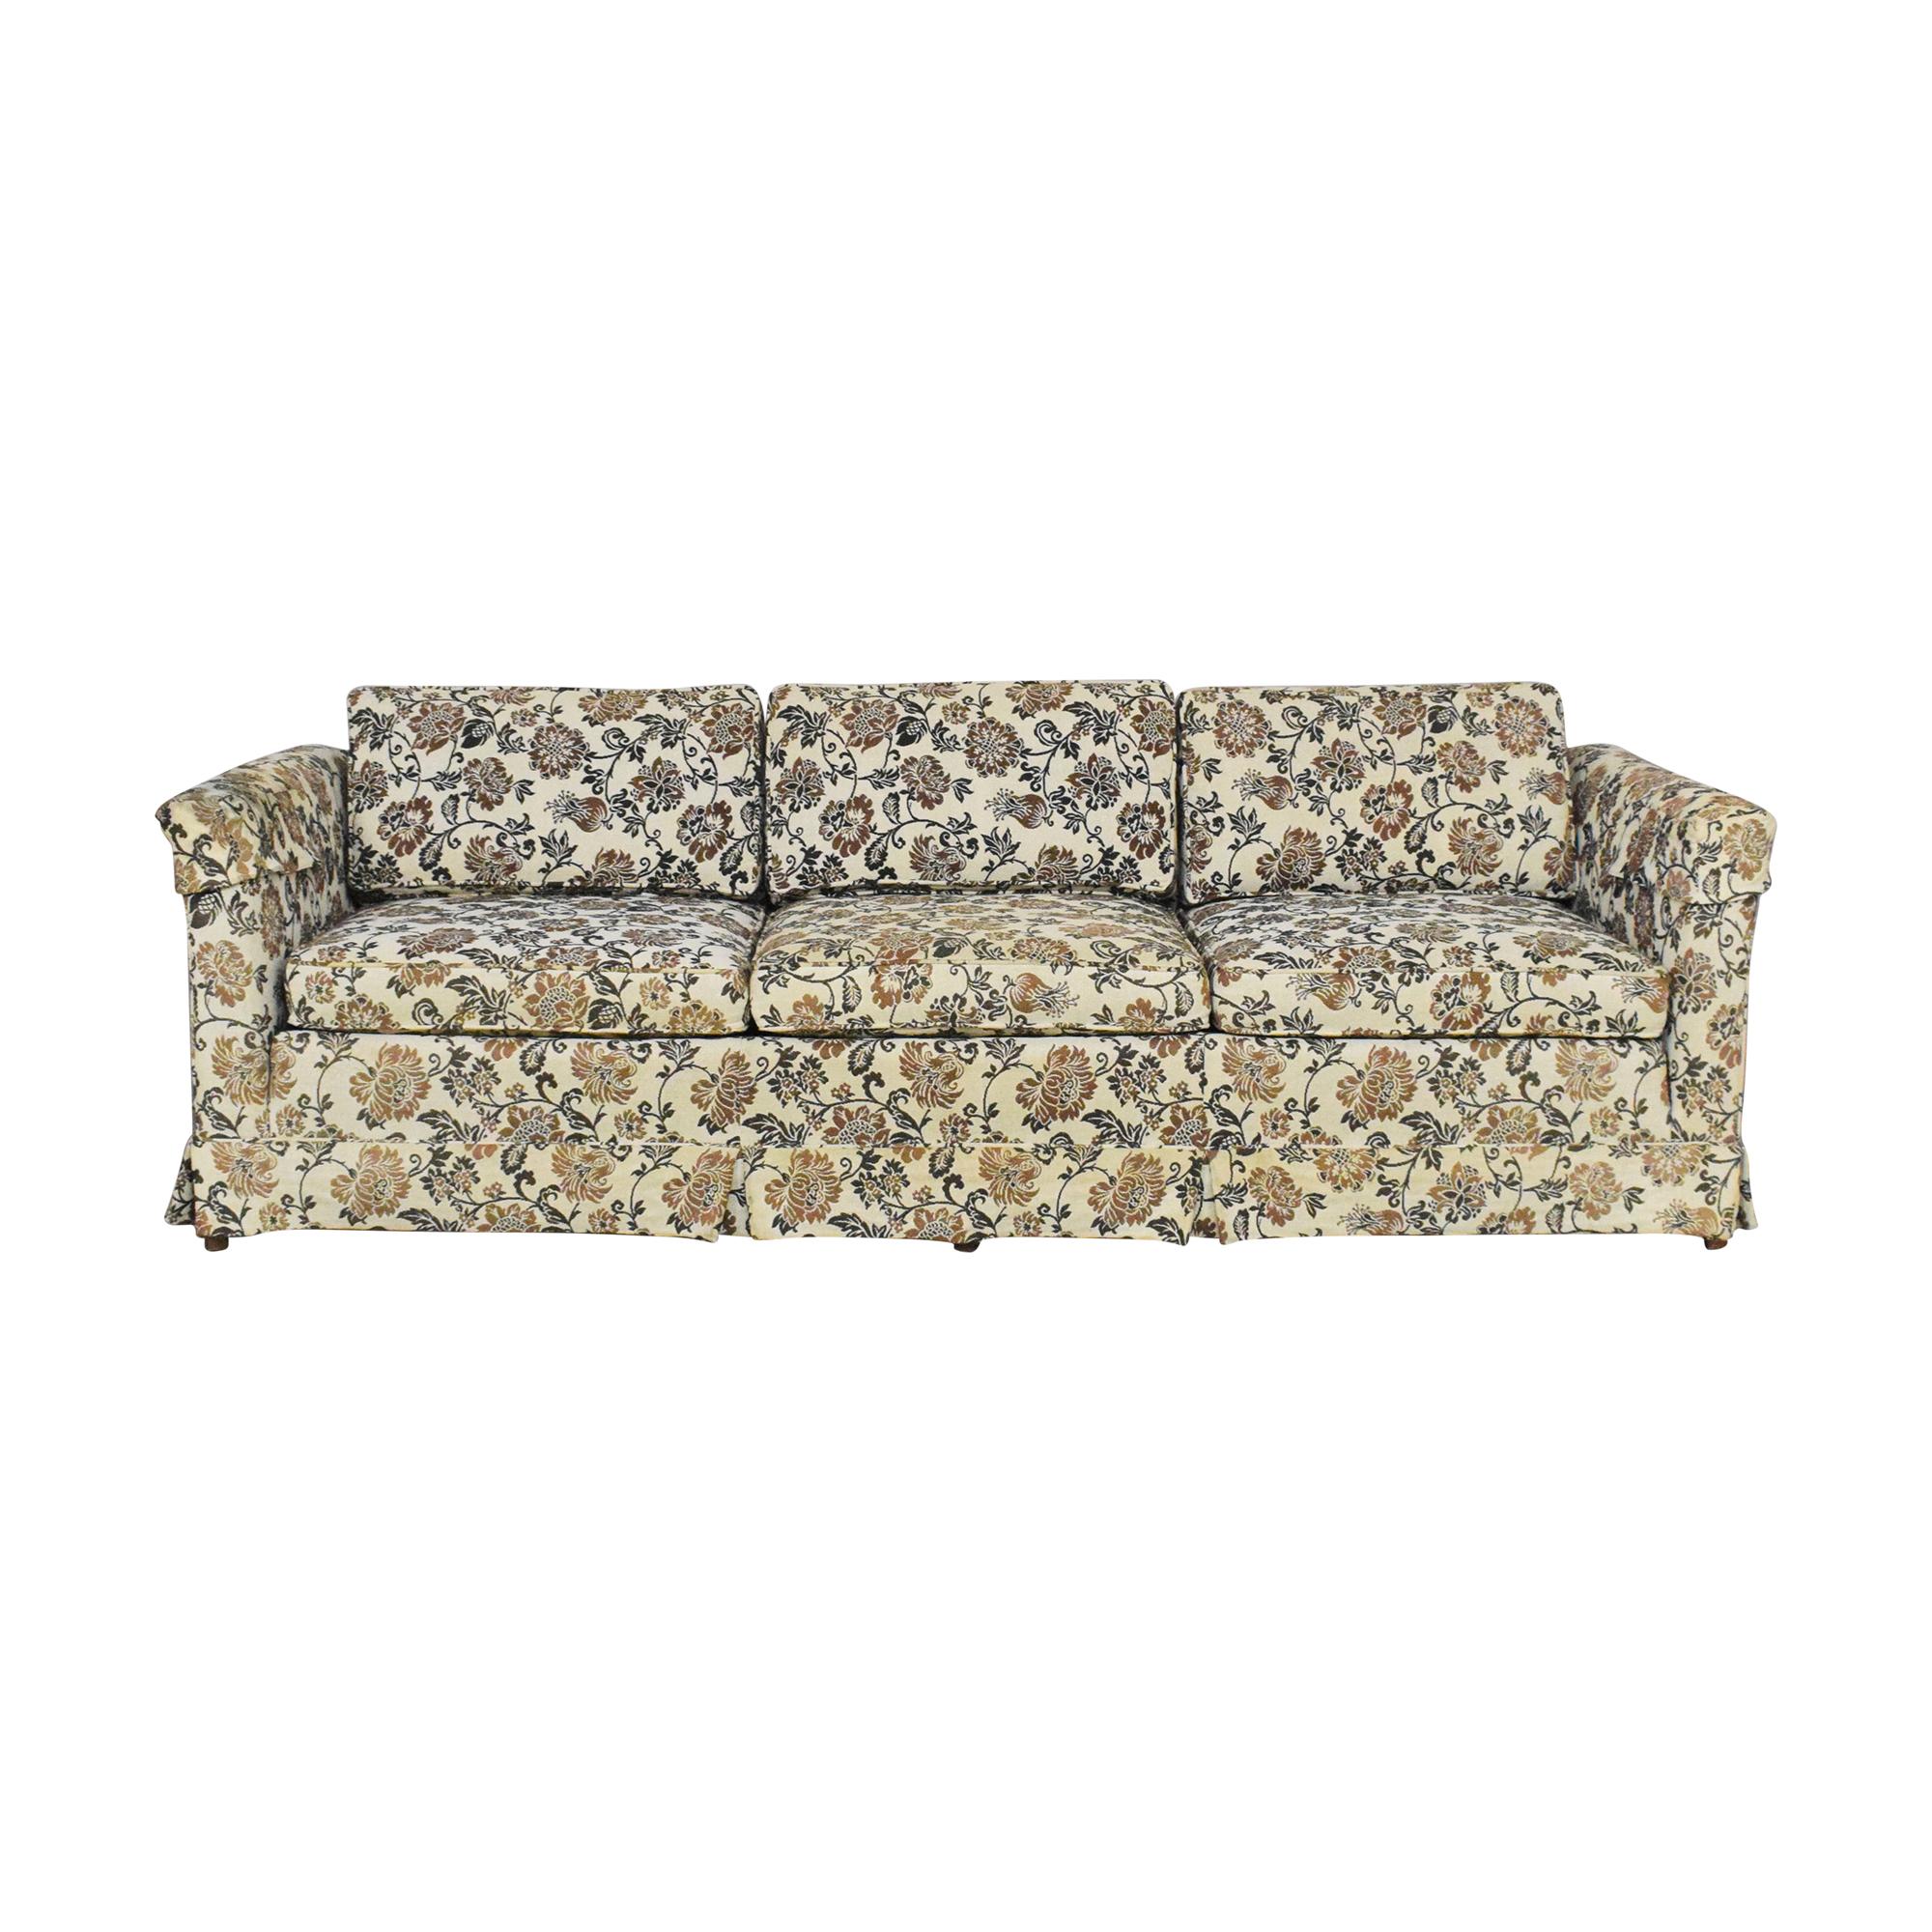 buy Ethan Allen Skirted Three Cushion Sofa Ethan Allen Classic Sofas